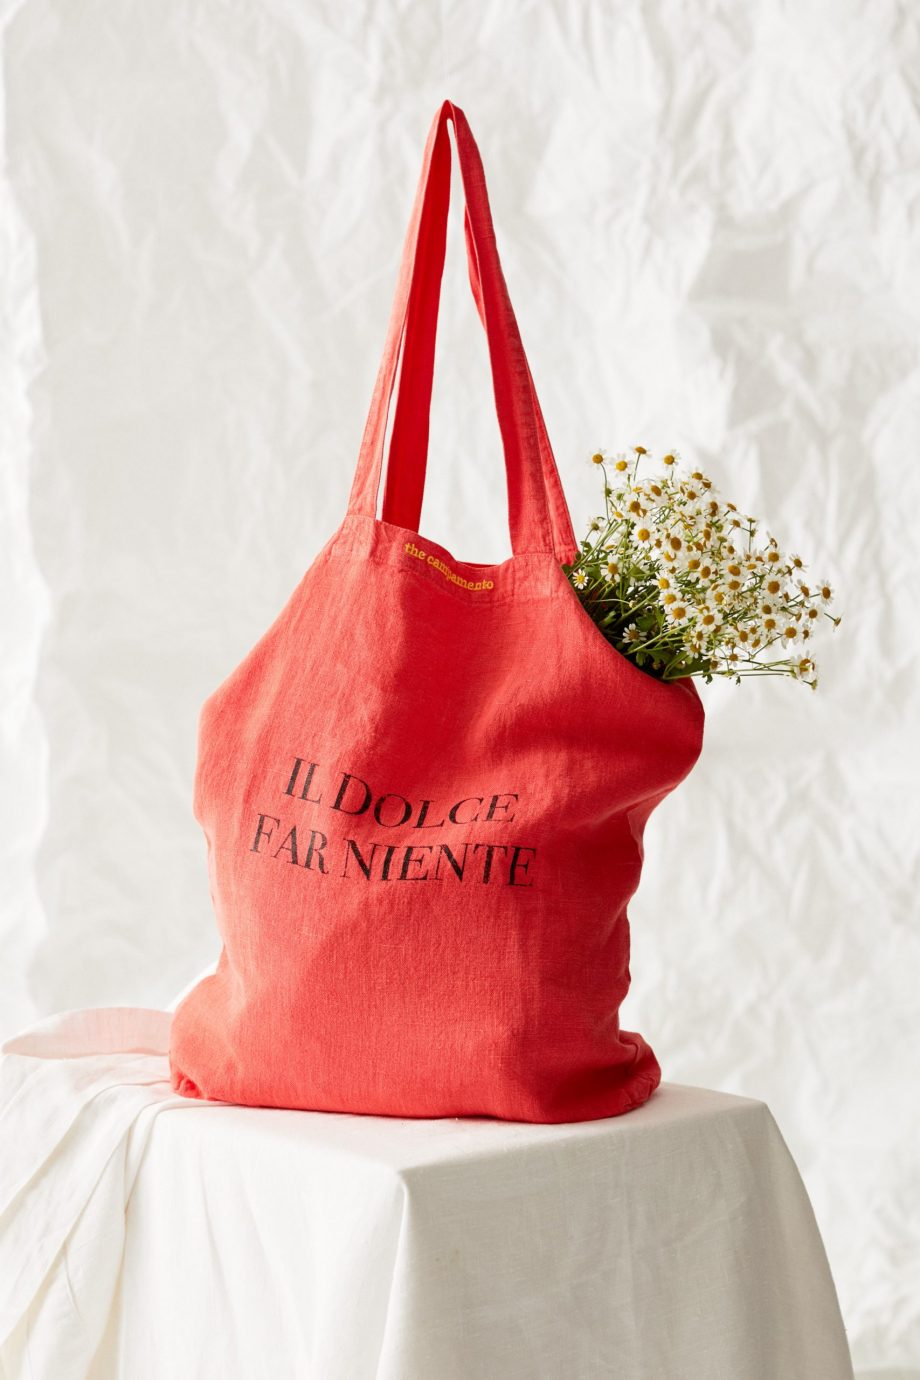 Il Dolce Far Niente Bag